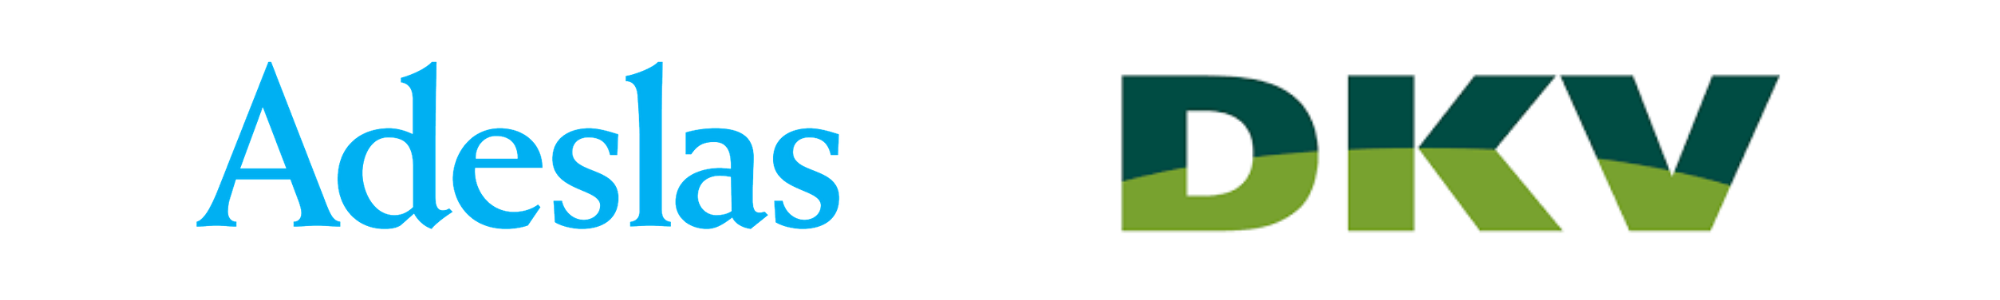 logos-seguros_isadora_adeslas_dkv